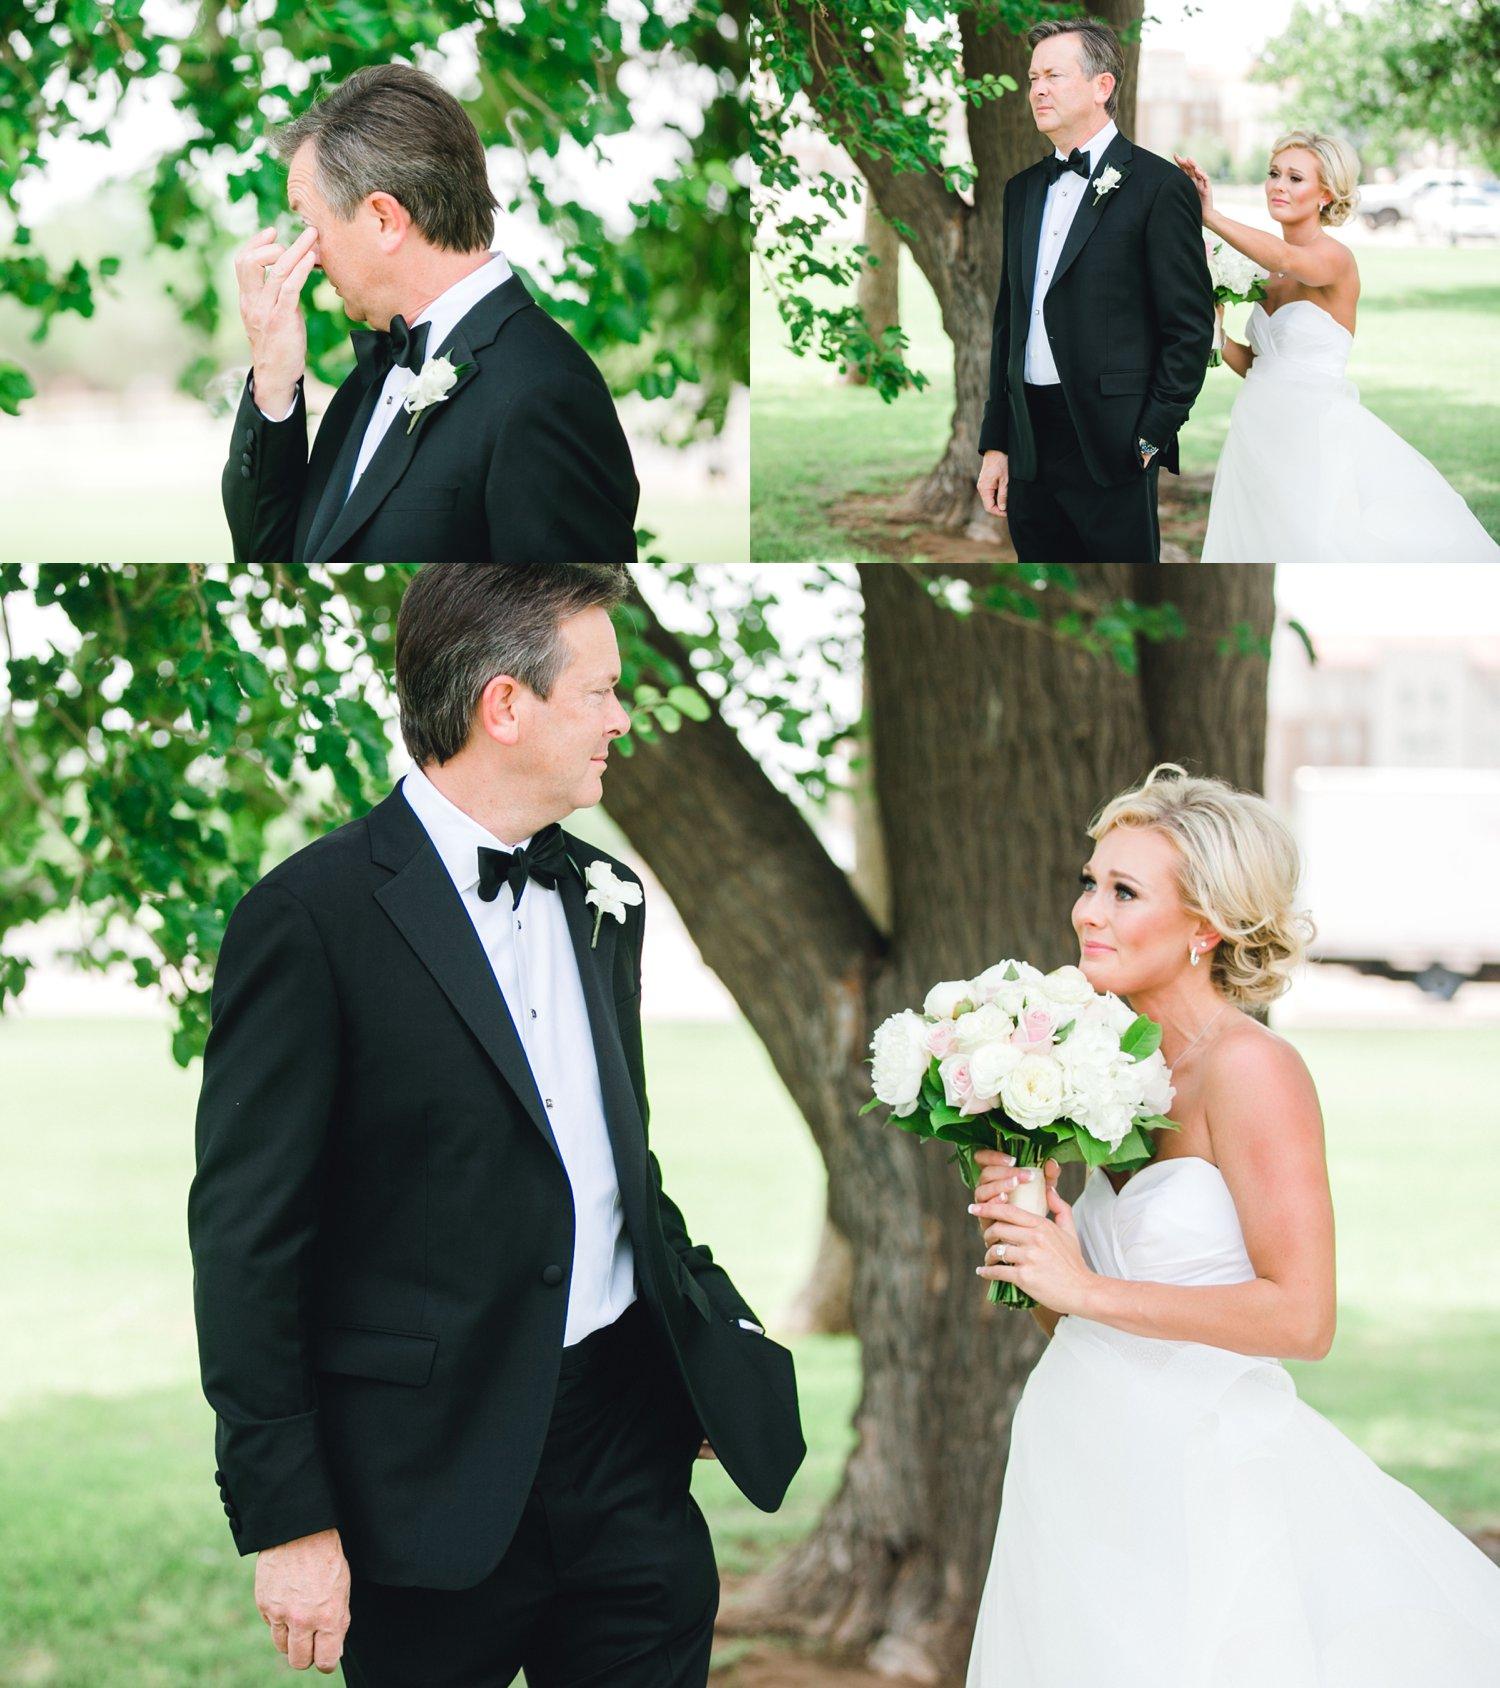 Taylor-and-Brock-Williams-Texas-Tech-University-Merket-Alumni-Center-Lubbock-Photographer-ALLEEJ0015.jpg